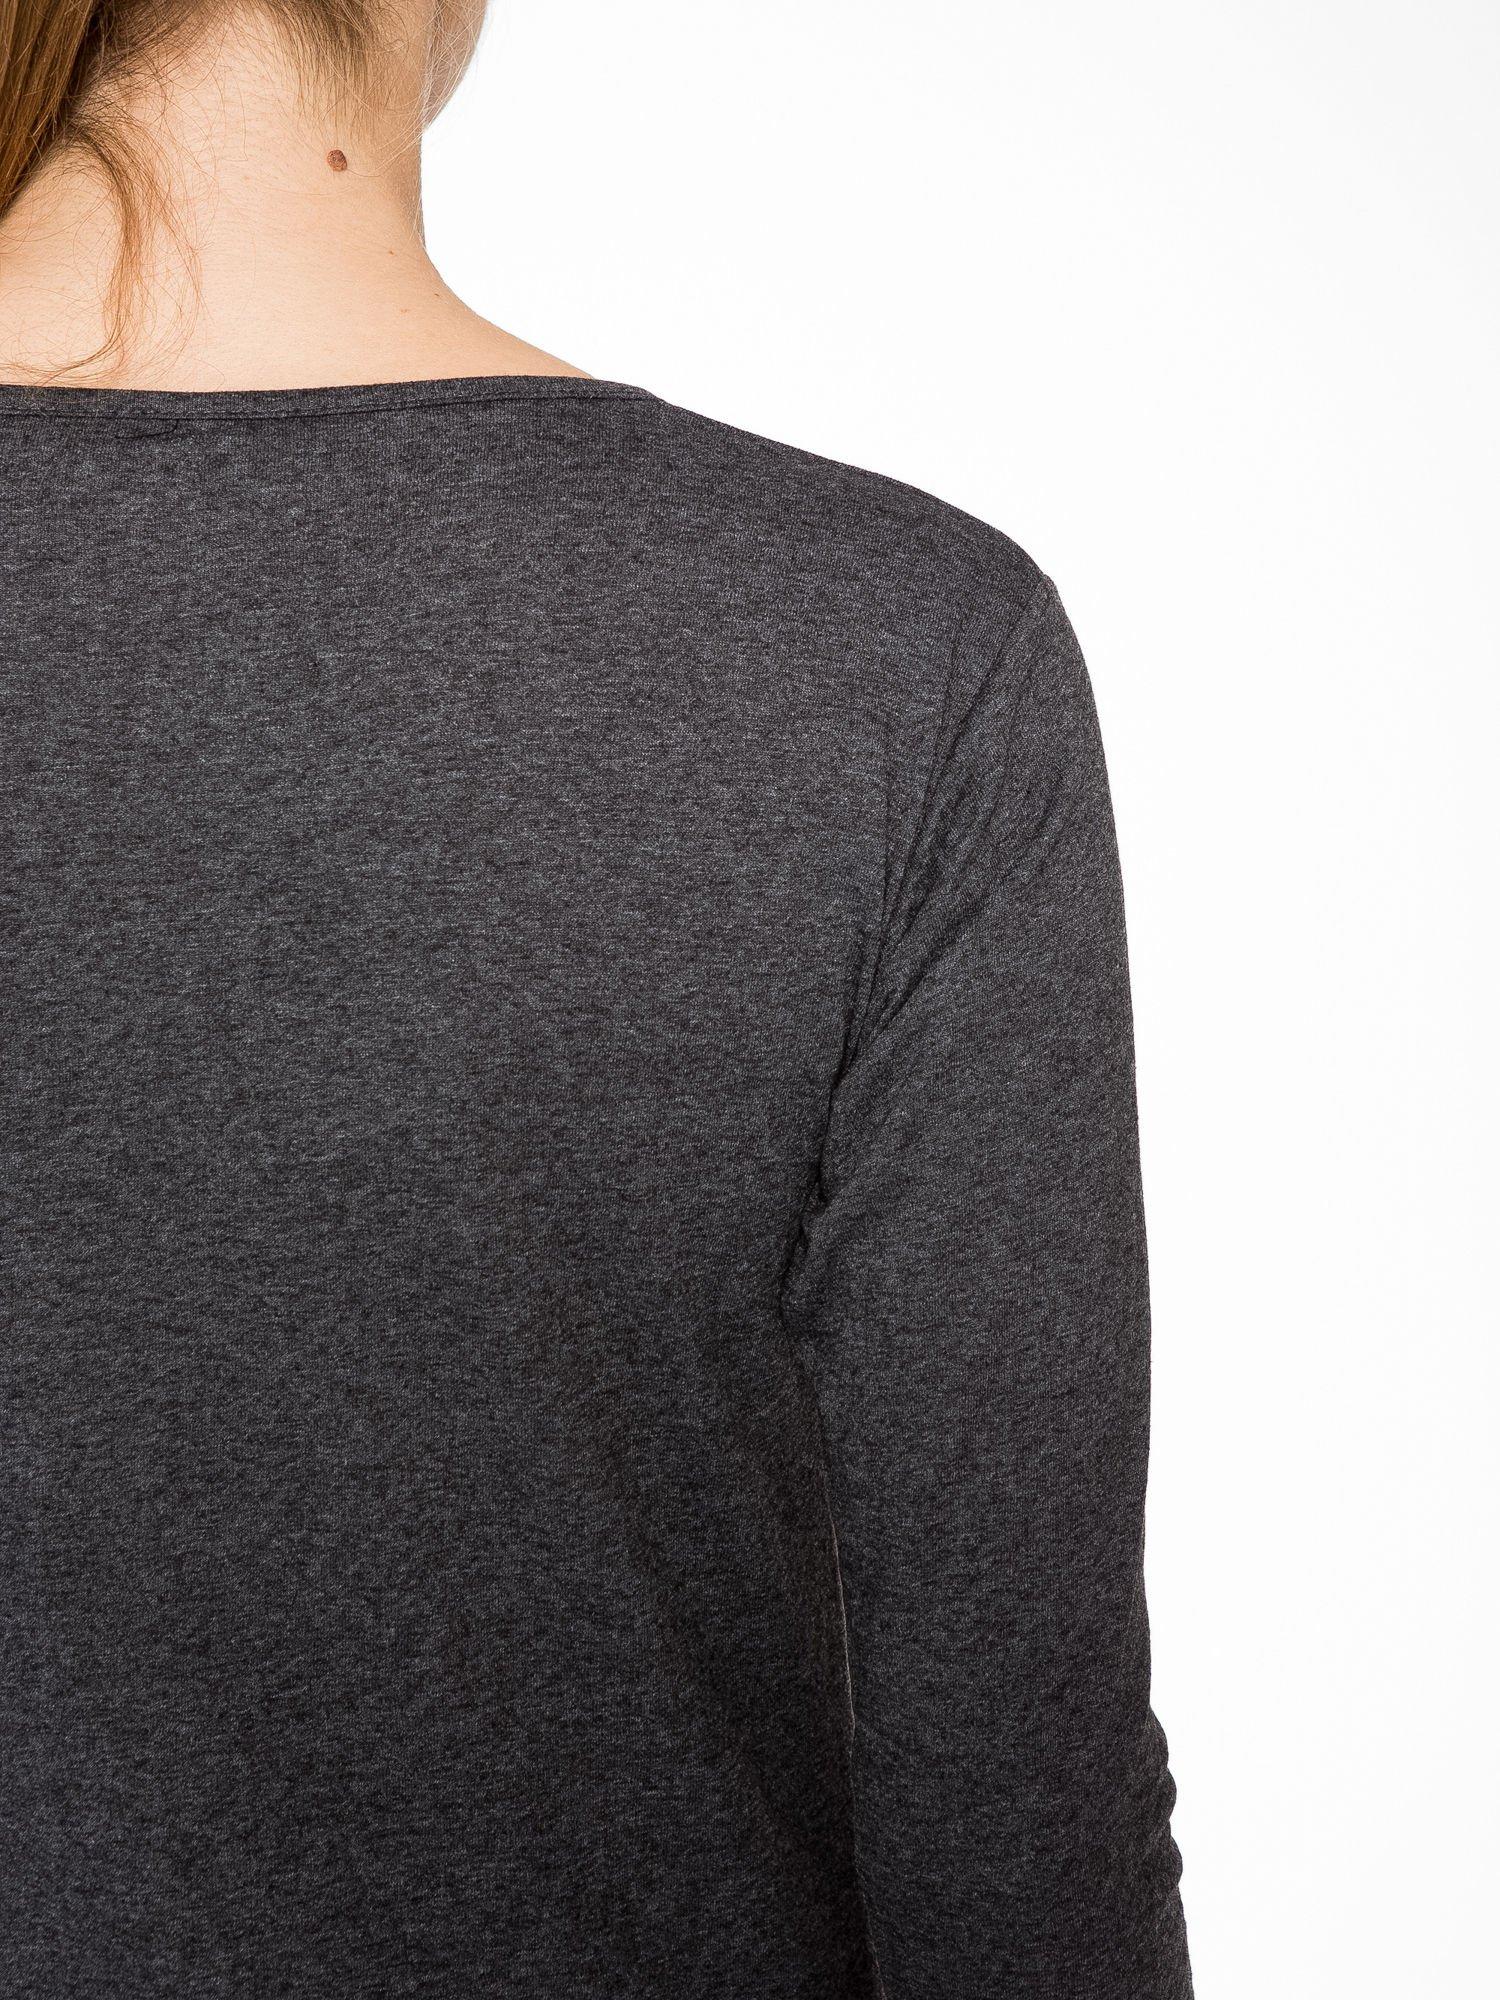 Szara bluzka z portretem Audrey Hepburn                                  zdj.                                  9